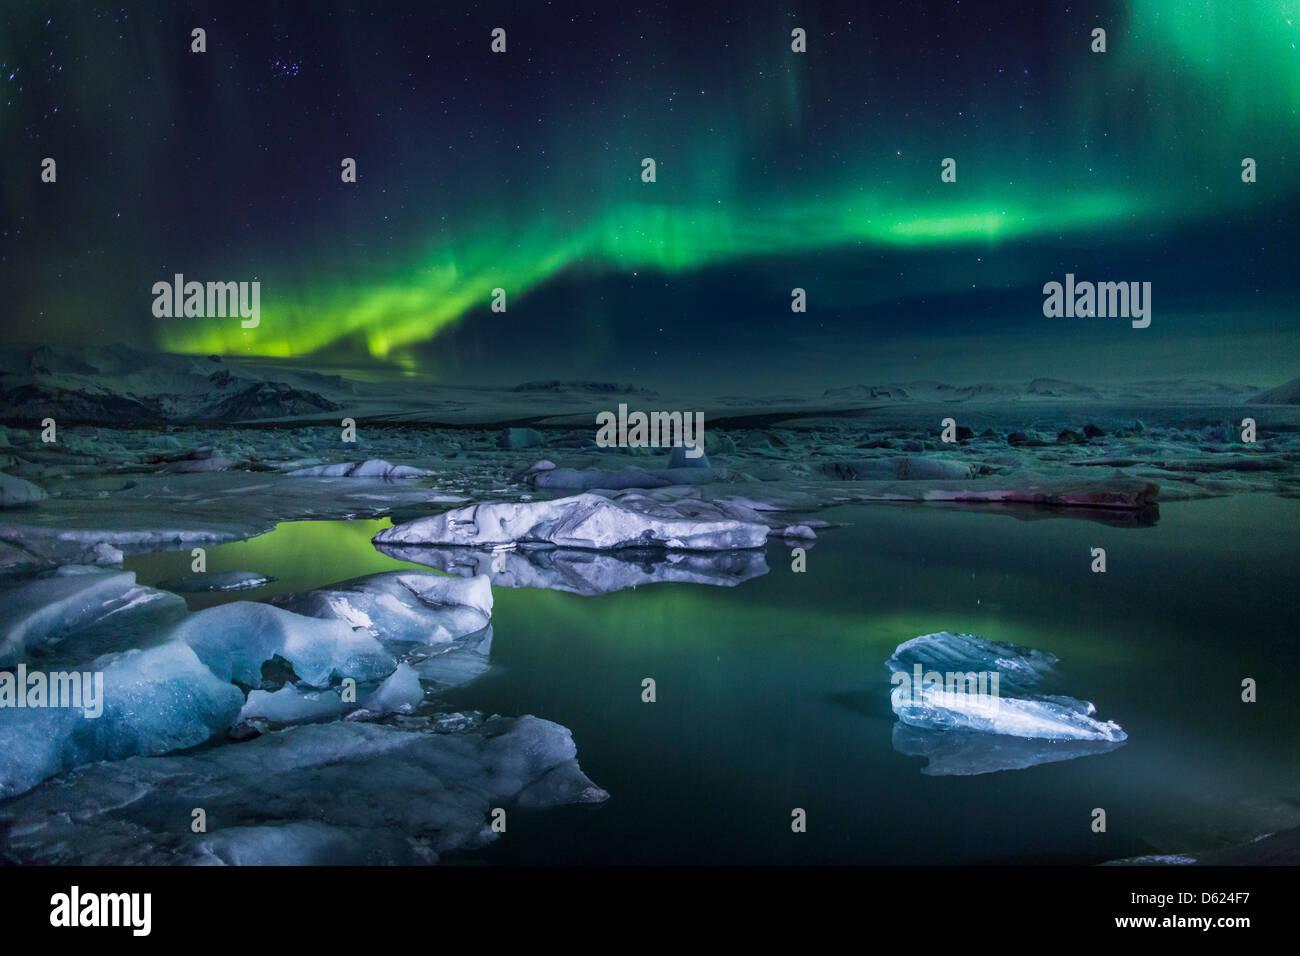 Aurore boréale ou Northern Lights à l'Breidarmerkurjokull Jokulsarlon, calotte de glace, l'Islande Photo Stock